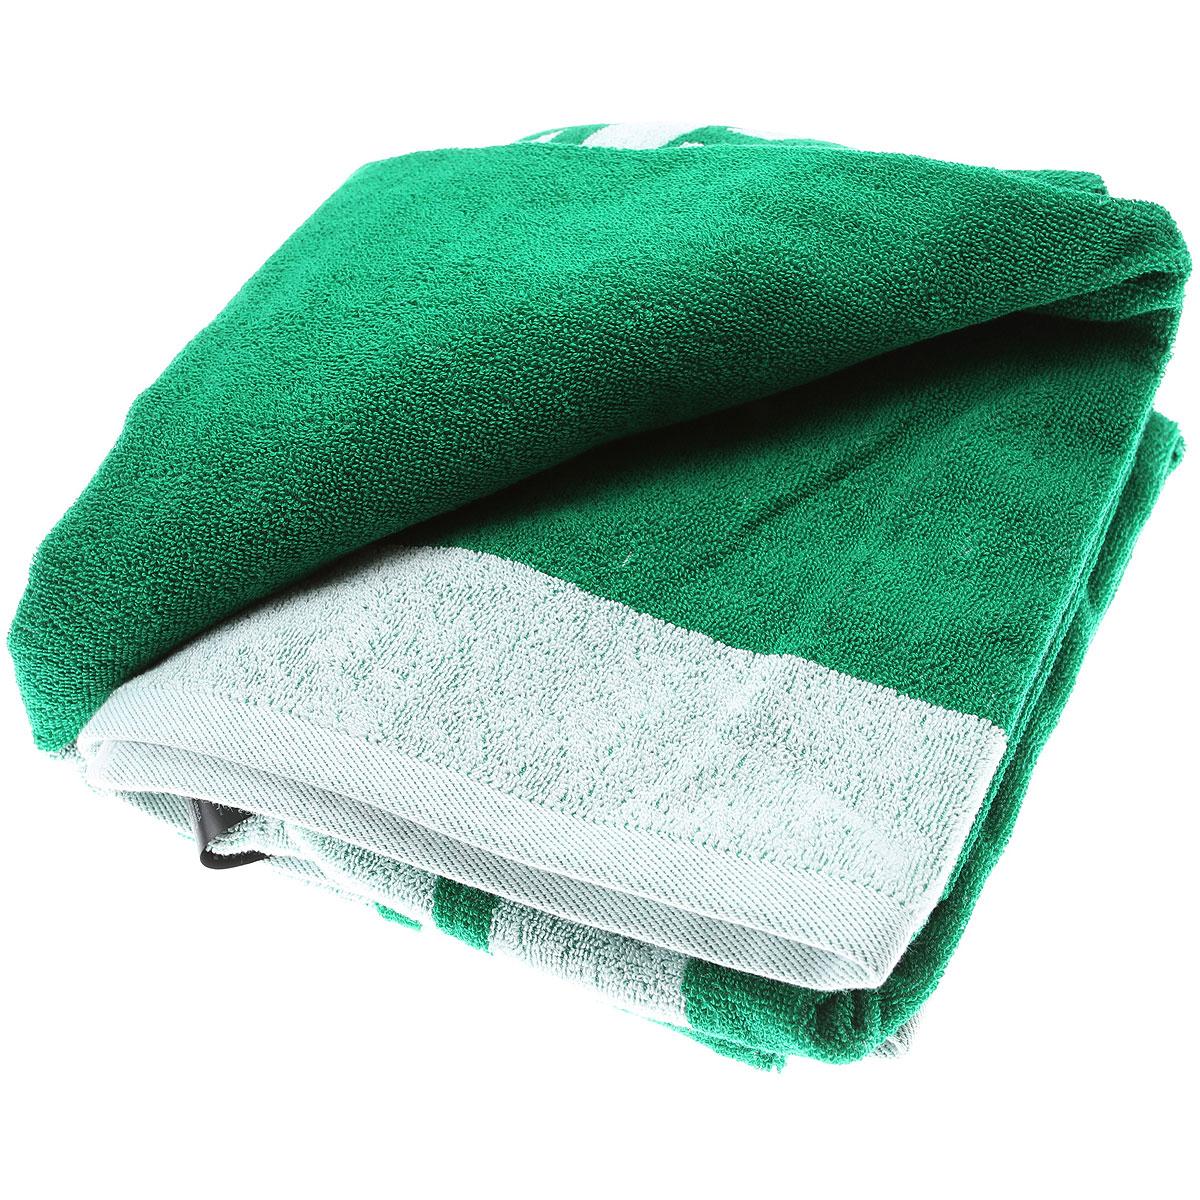 Emporio Armani Beach Towel On Sale, Green, Cotton, 2019